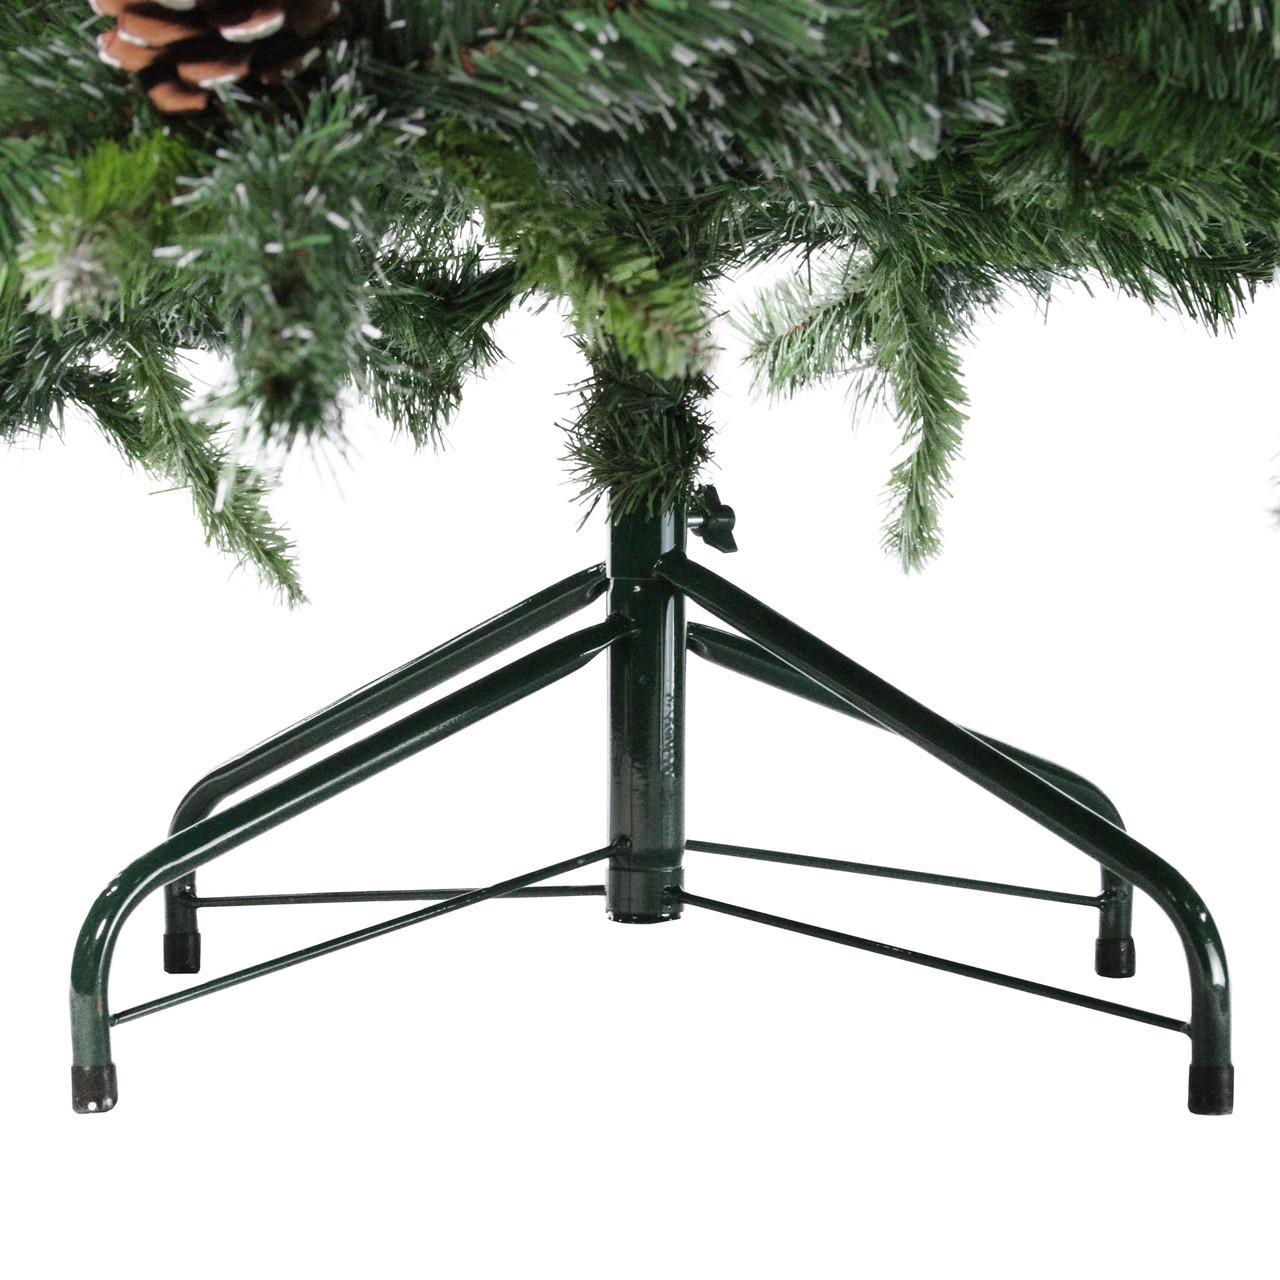 65 Snowy Delta Pine With Pine Cones Artificial Christmas Tree